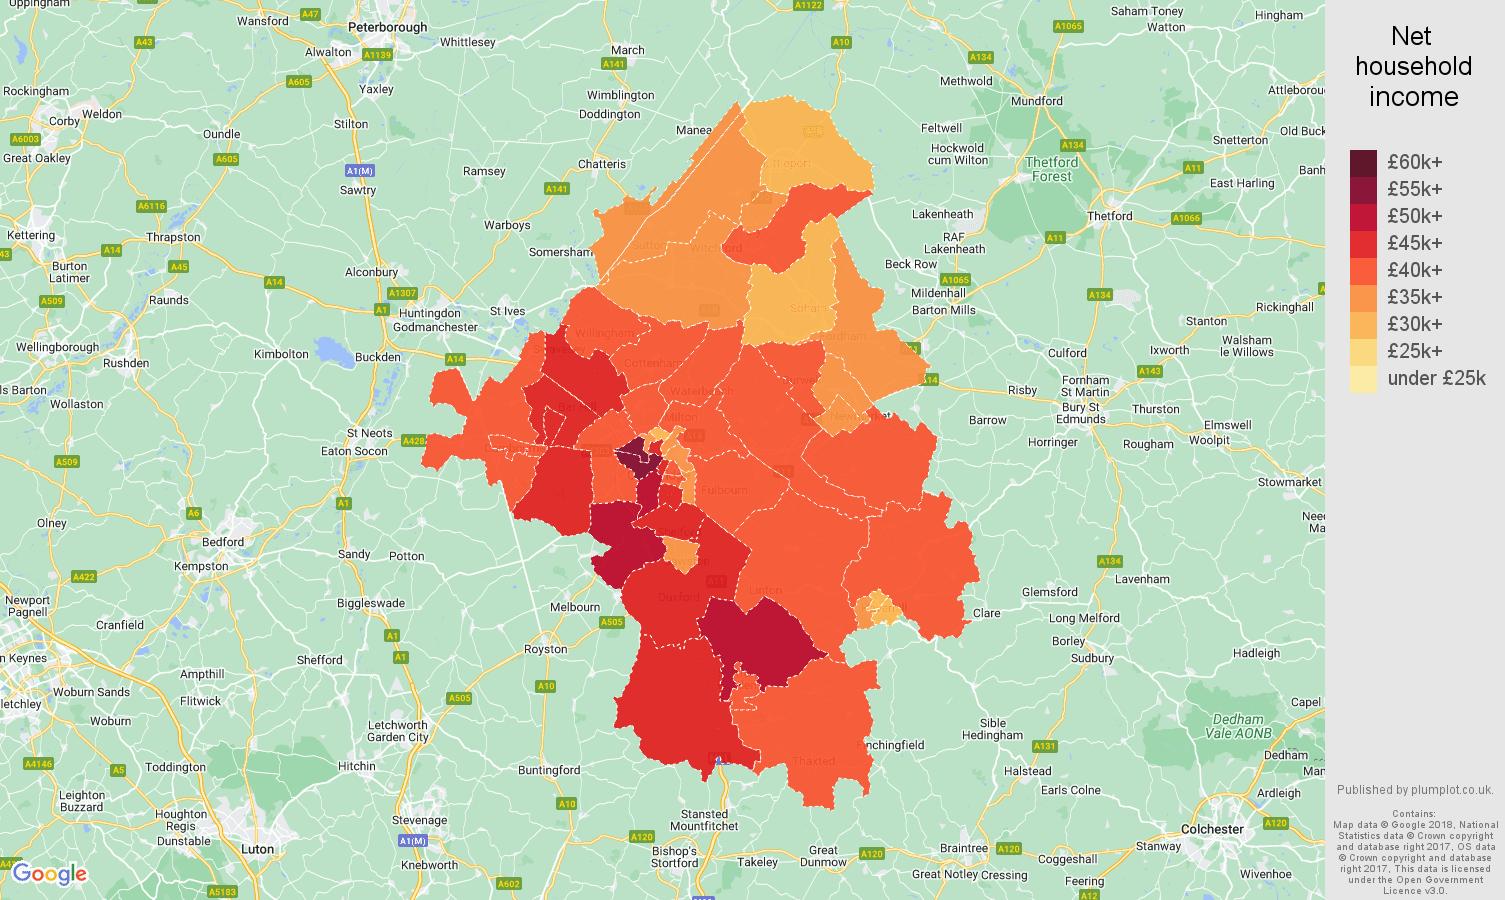 Cambridge net household income map